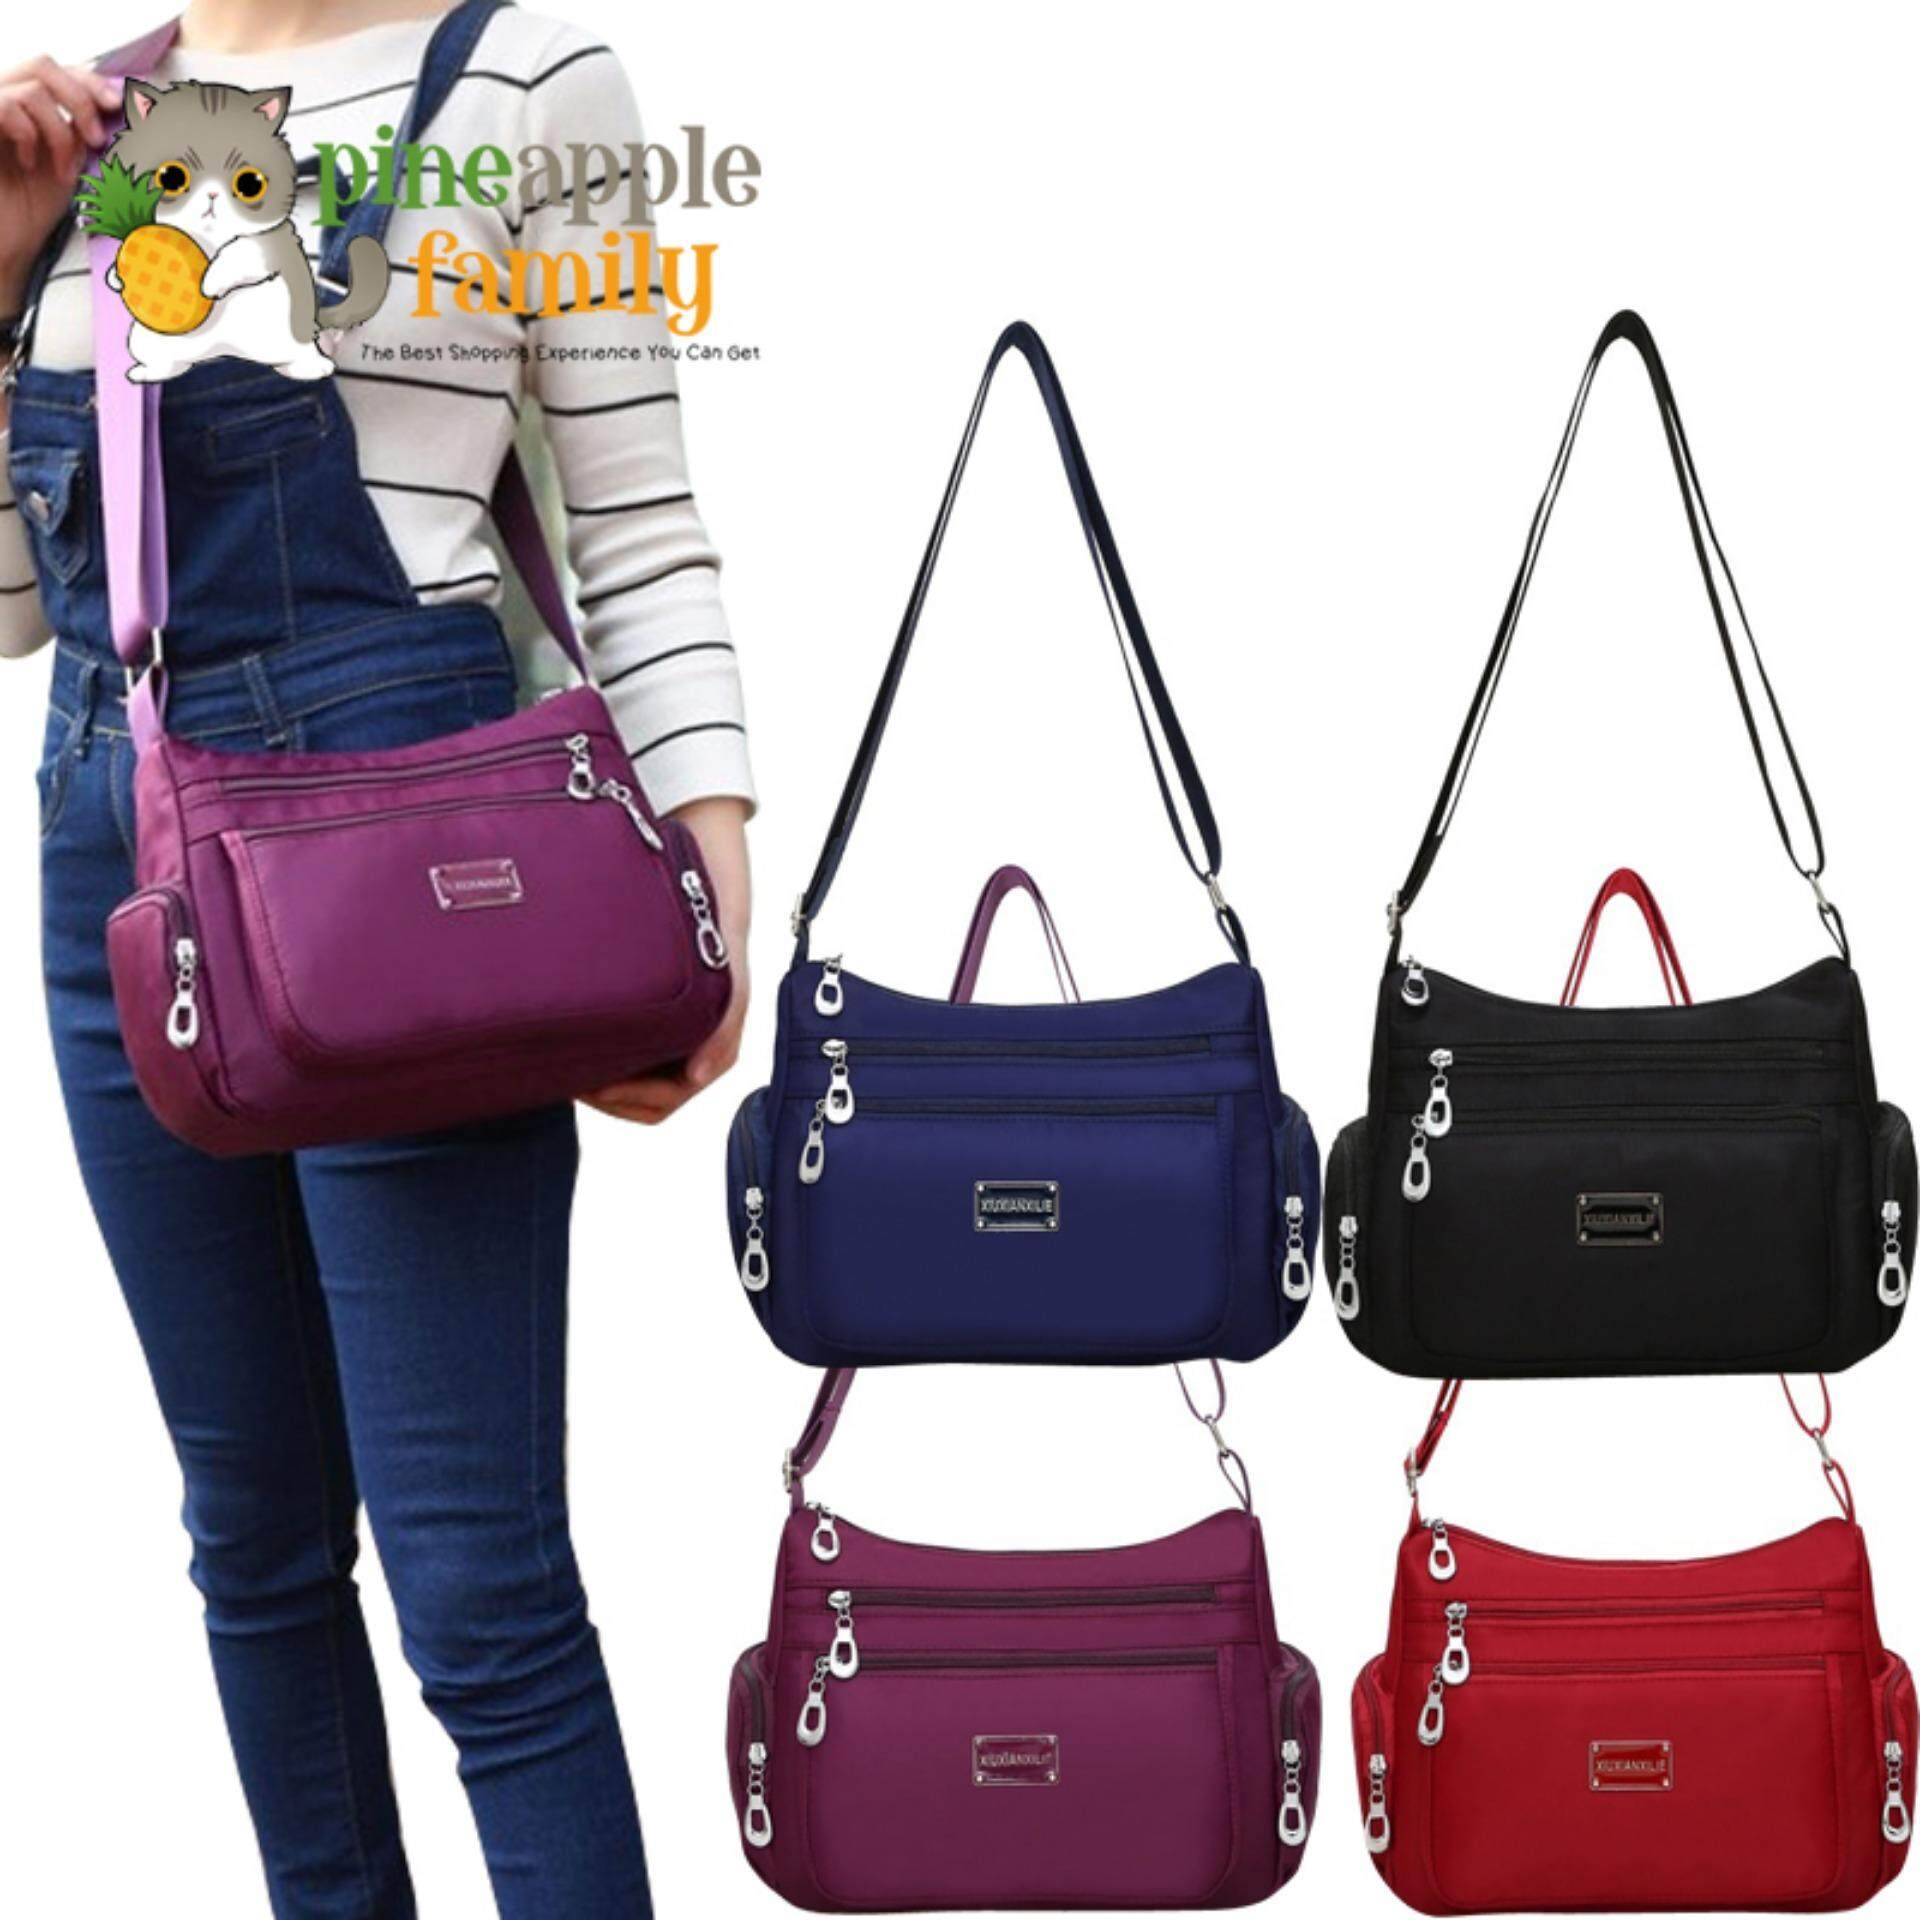 fe2675f73b6b Women Bags - Buy Women Bags at Best Price in Malaysia | www.lazada ...